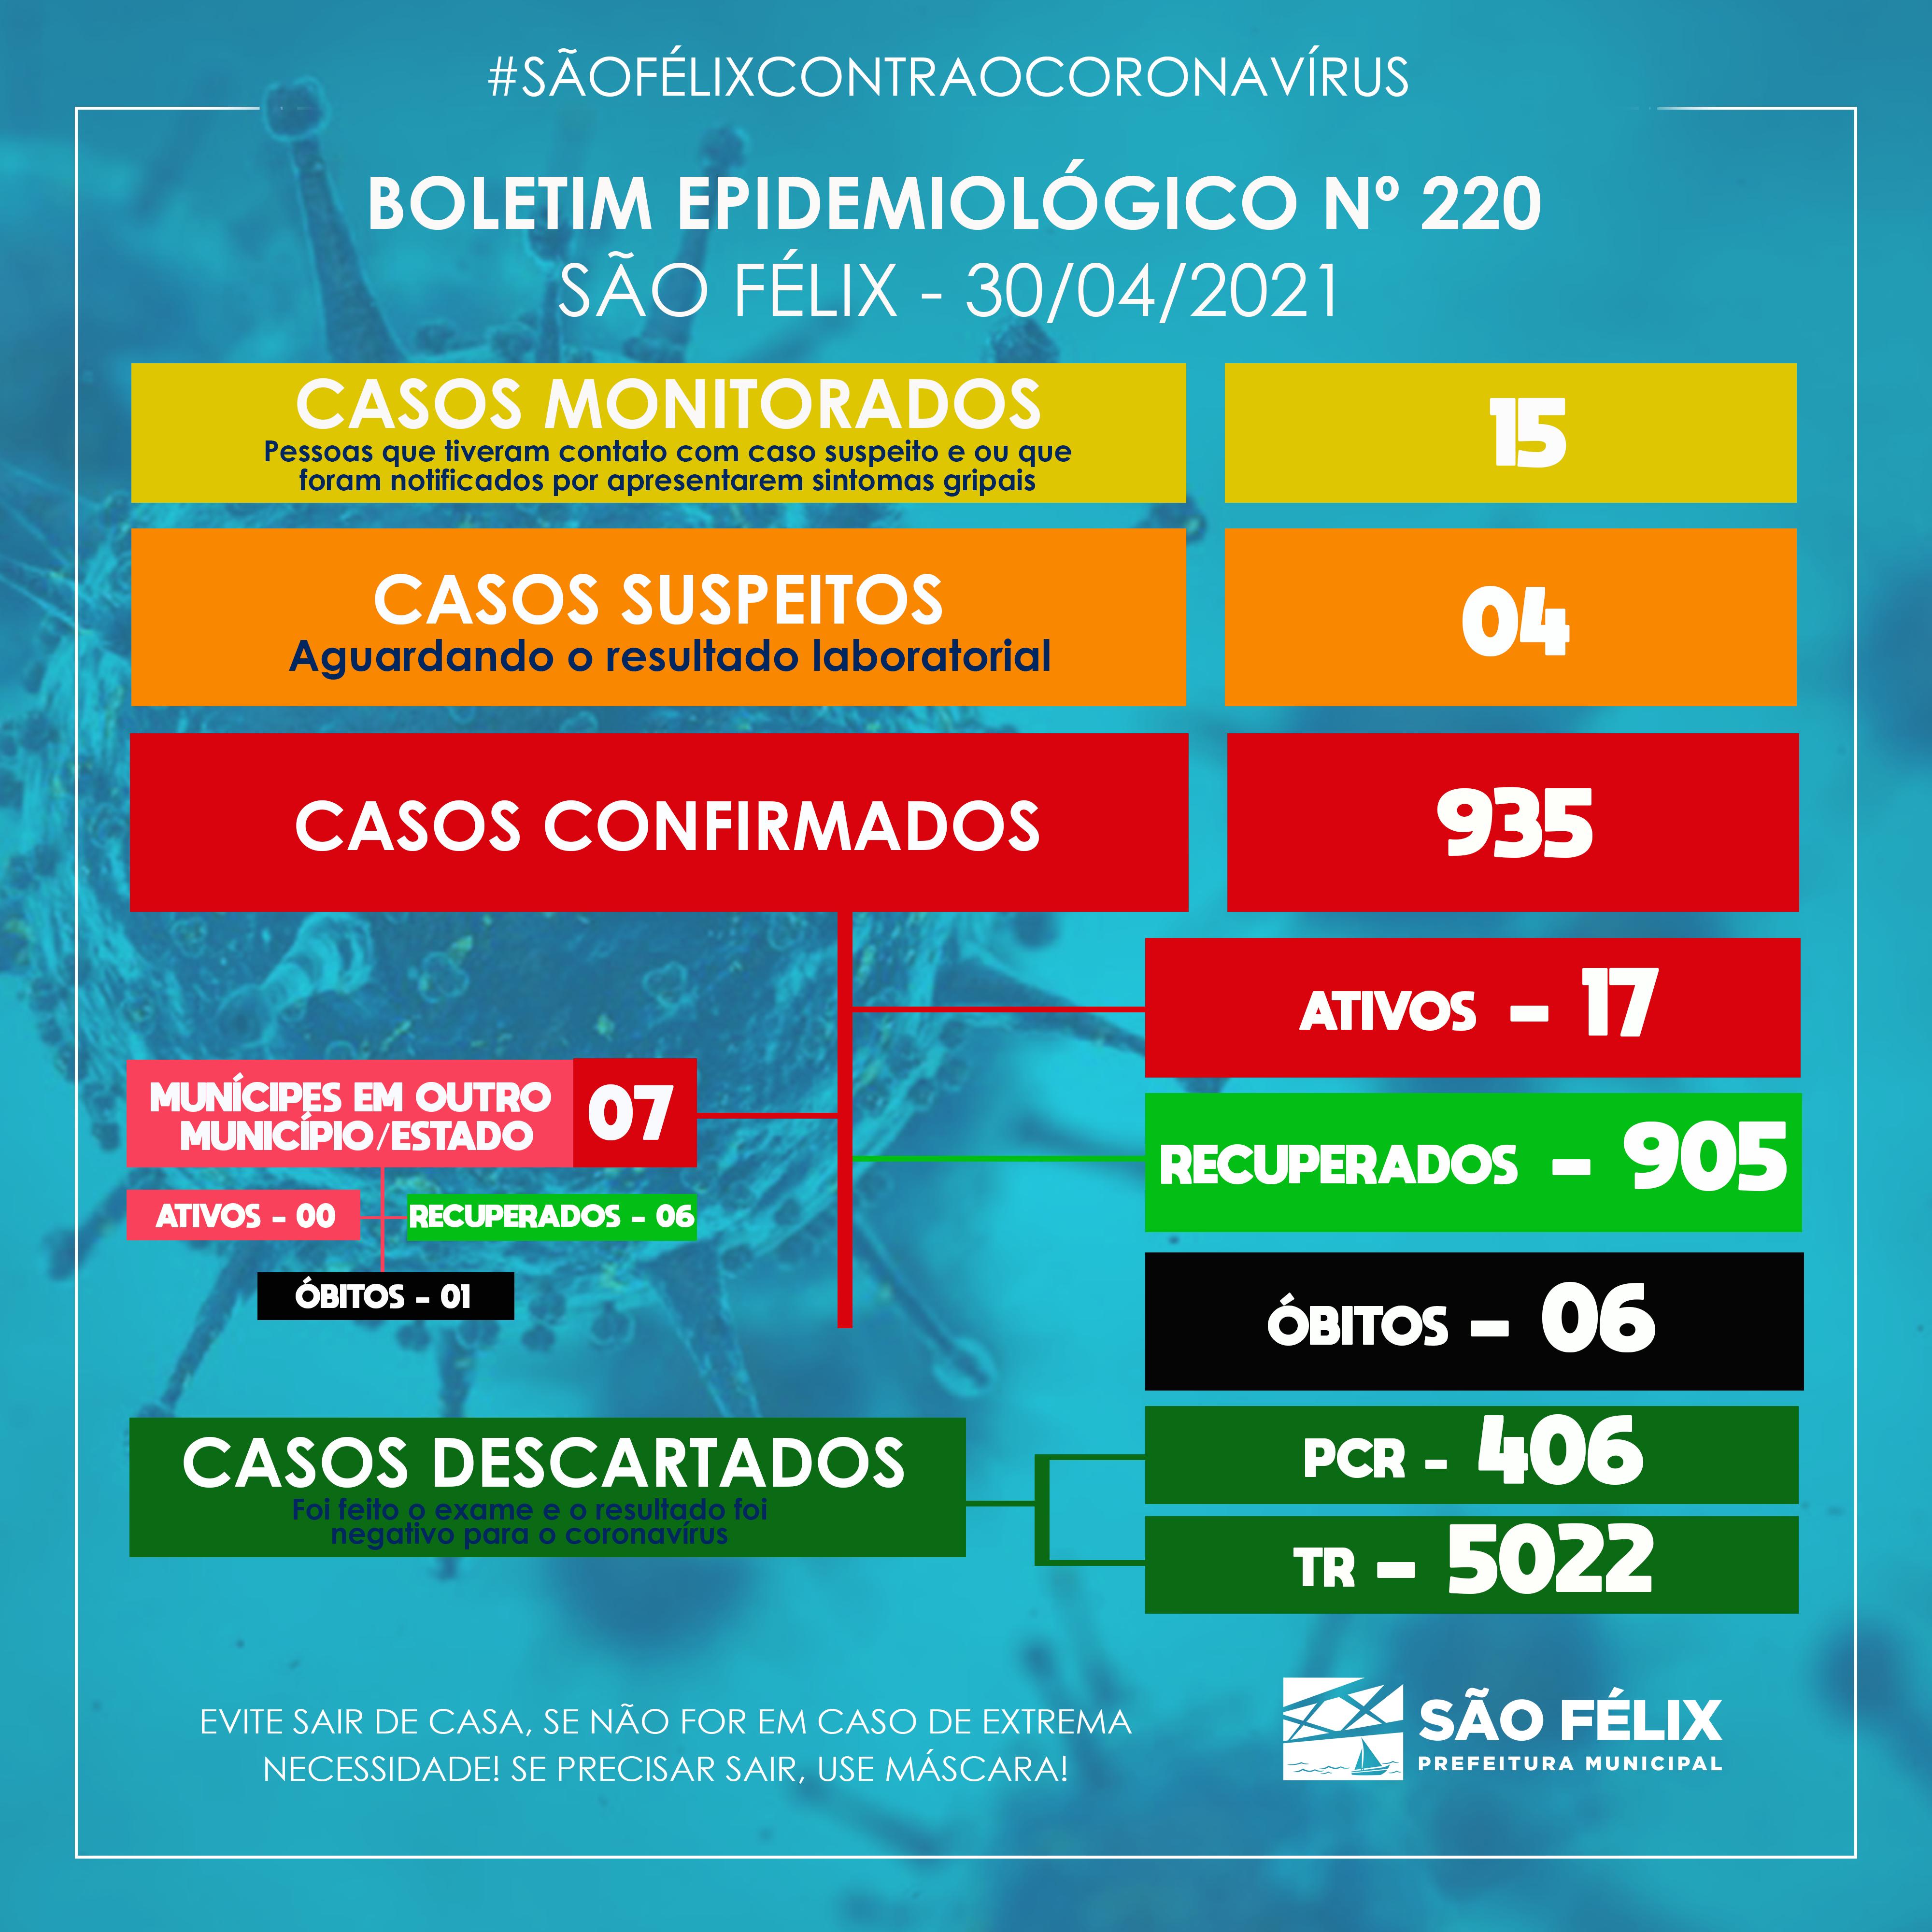 BOLETIM EPIDEMIOLÓGICO Nº 220